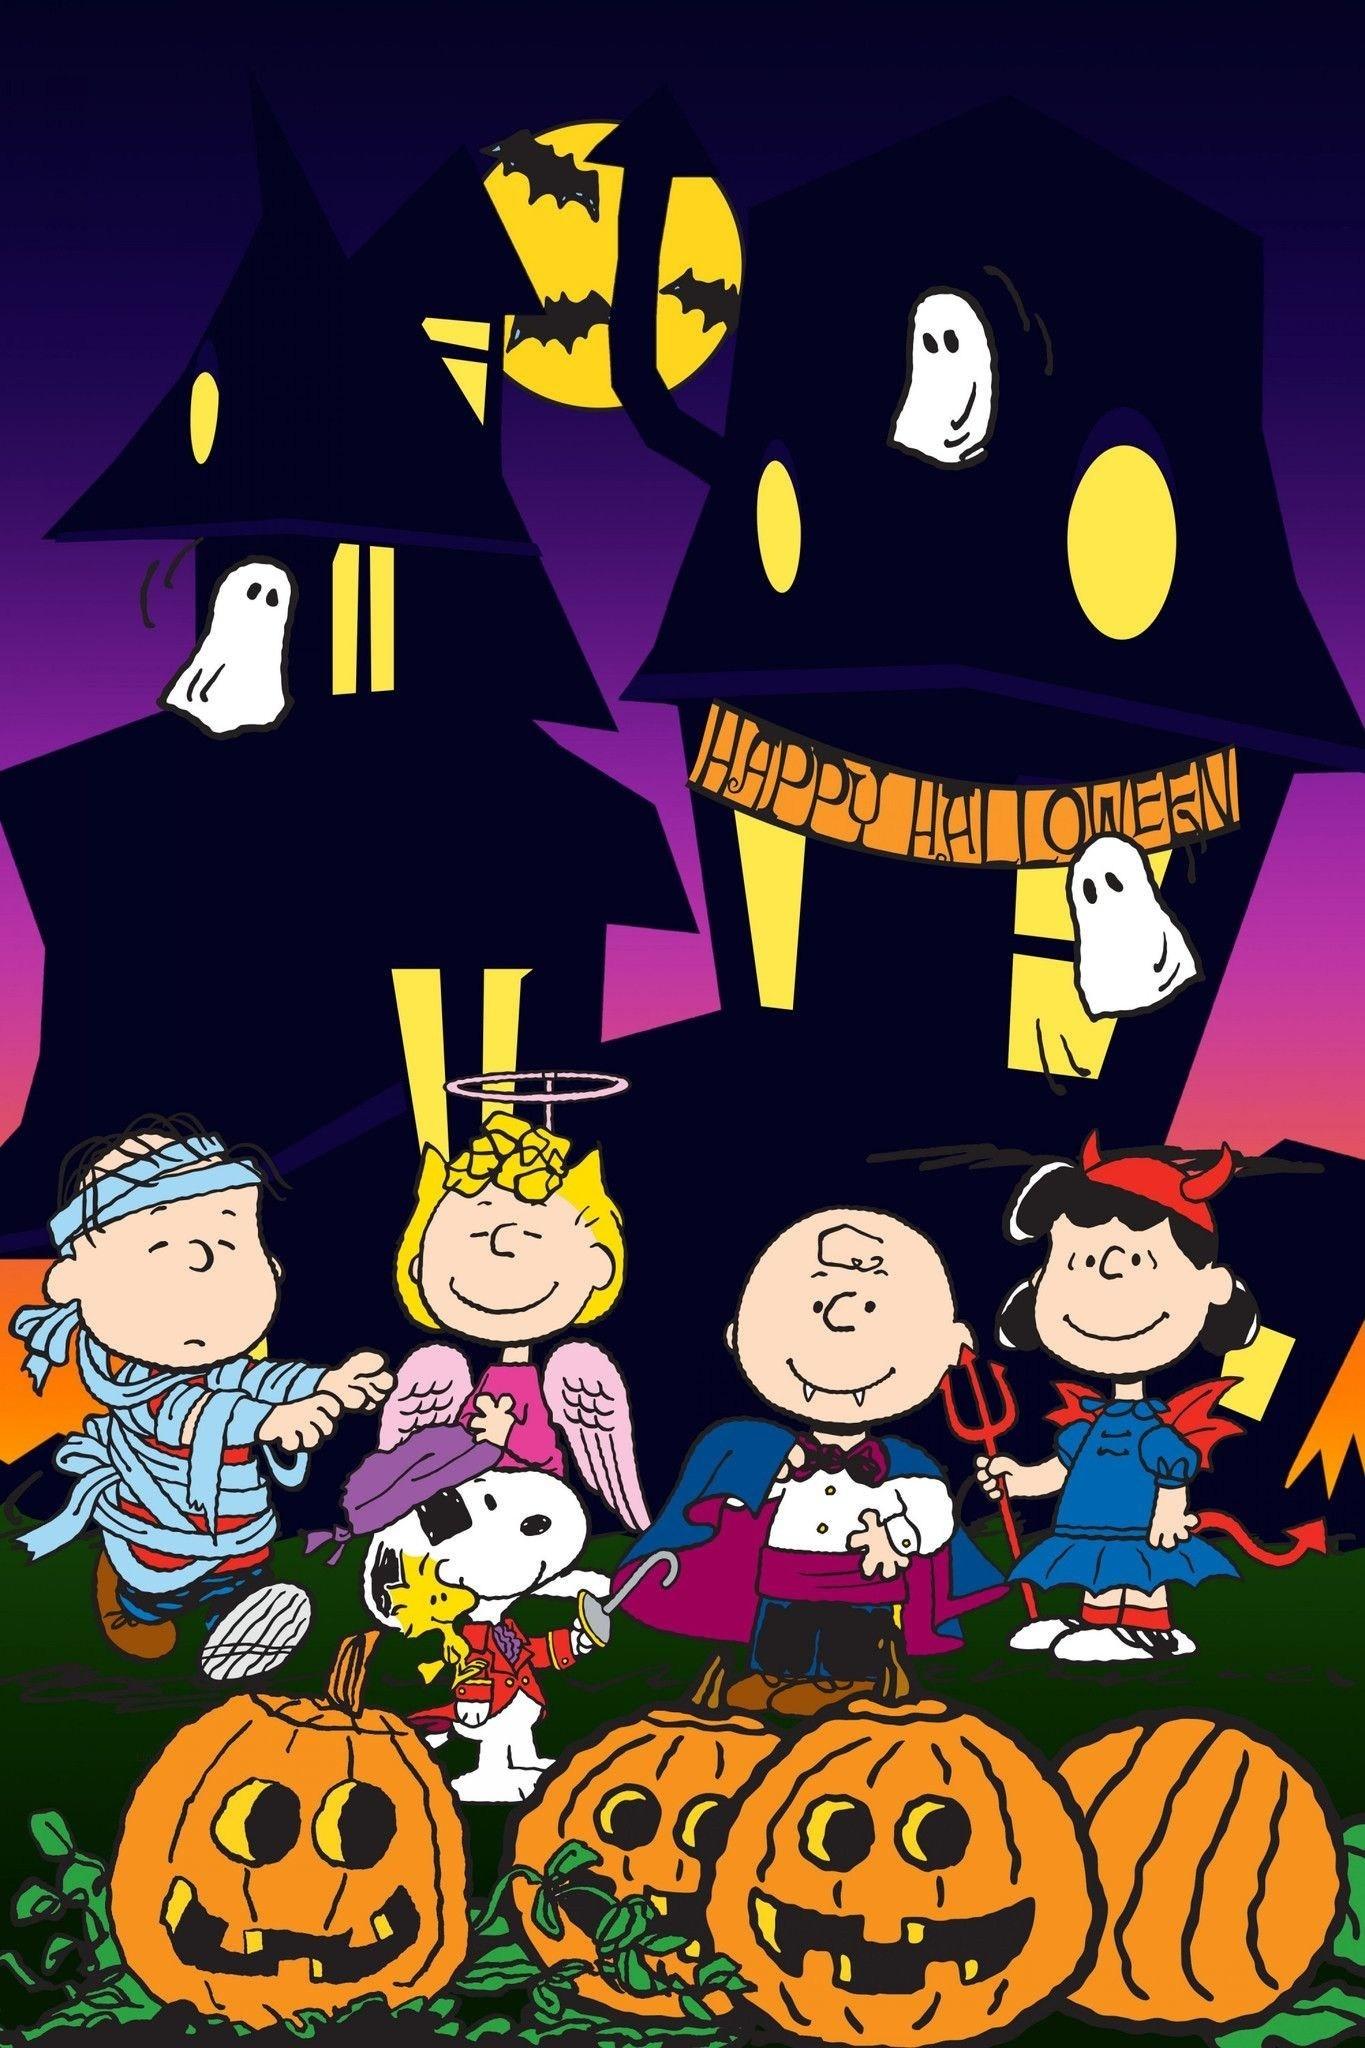 Peanuts Halloween Wallpaper Free Jpg Peanuts Halloween - Great Pumpkin Charlie Brown 2018 - HD Wallpaper